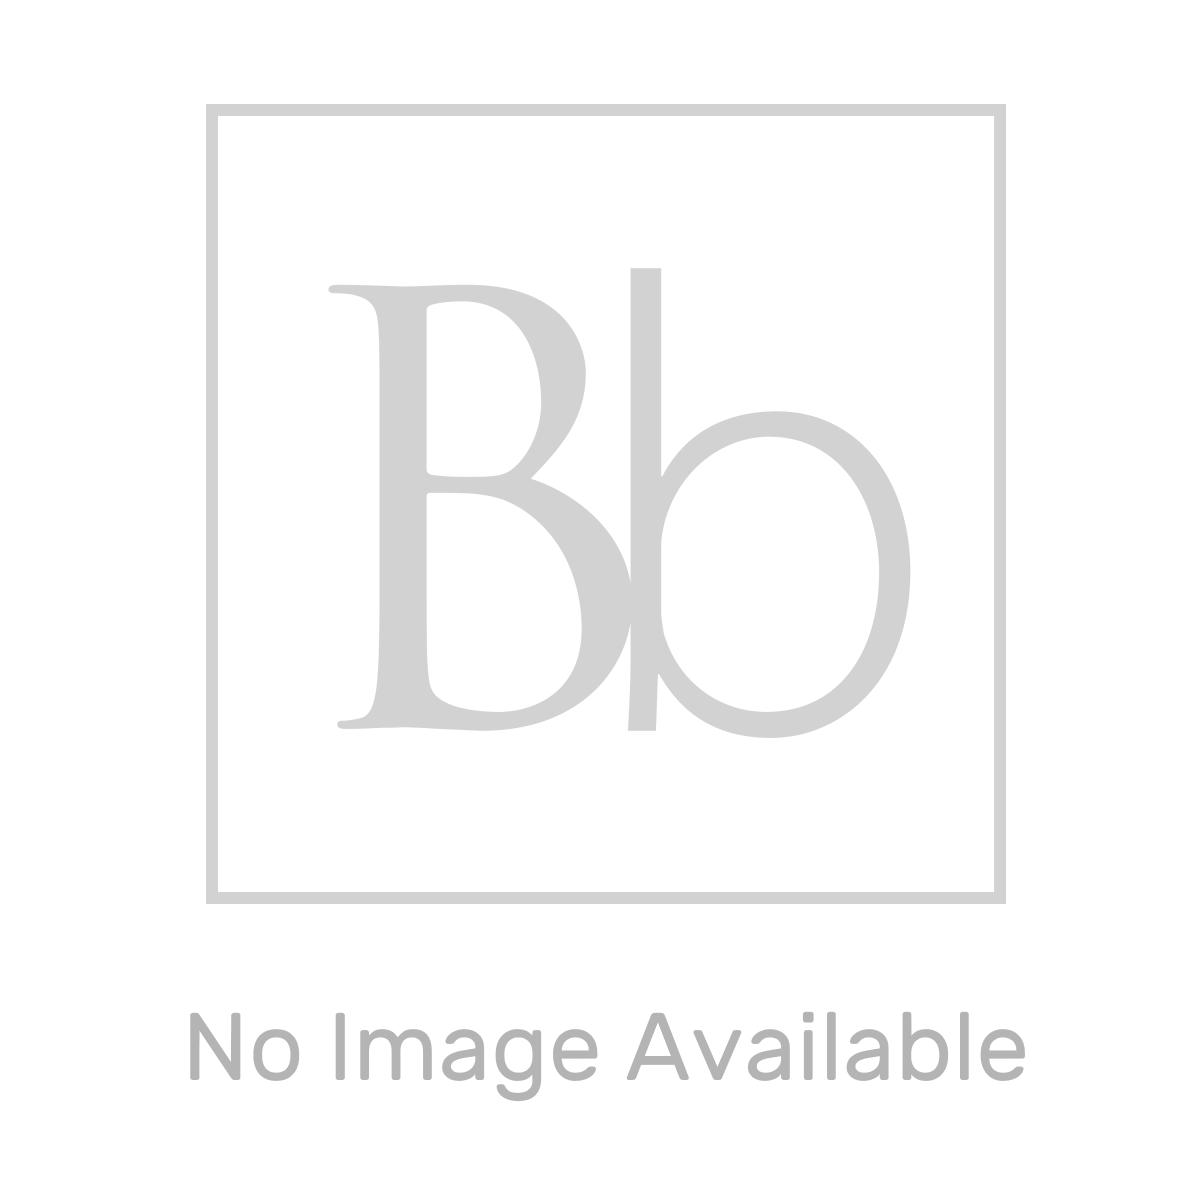 HiB Stratus 60 LED Double Door Cabinet